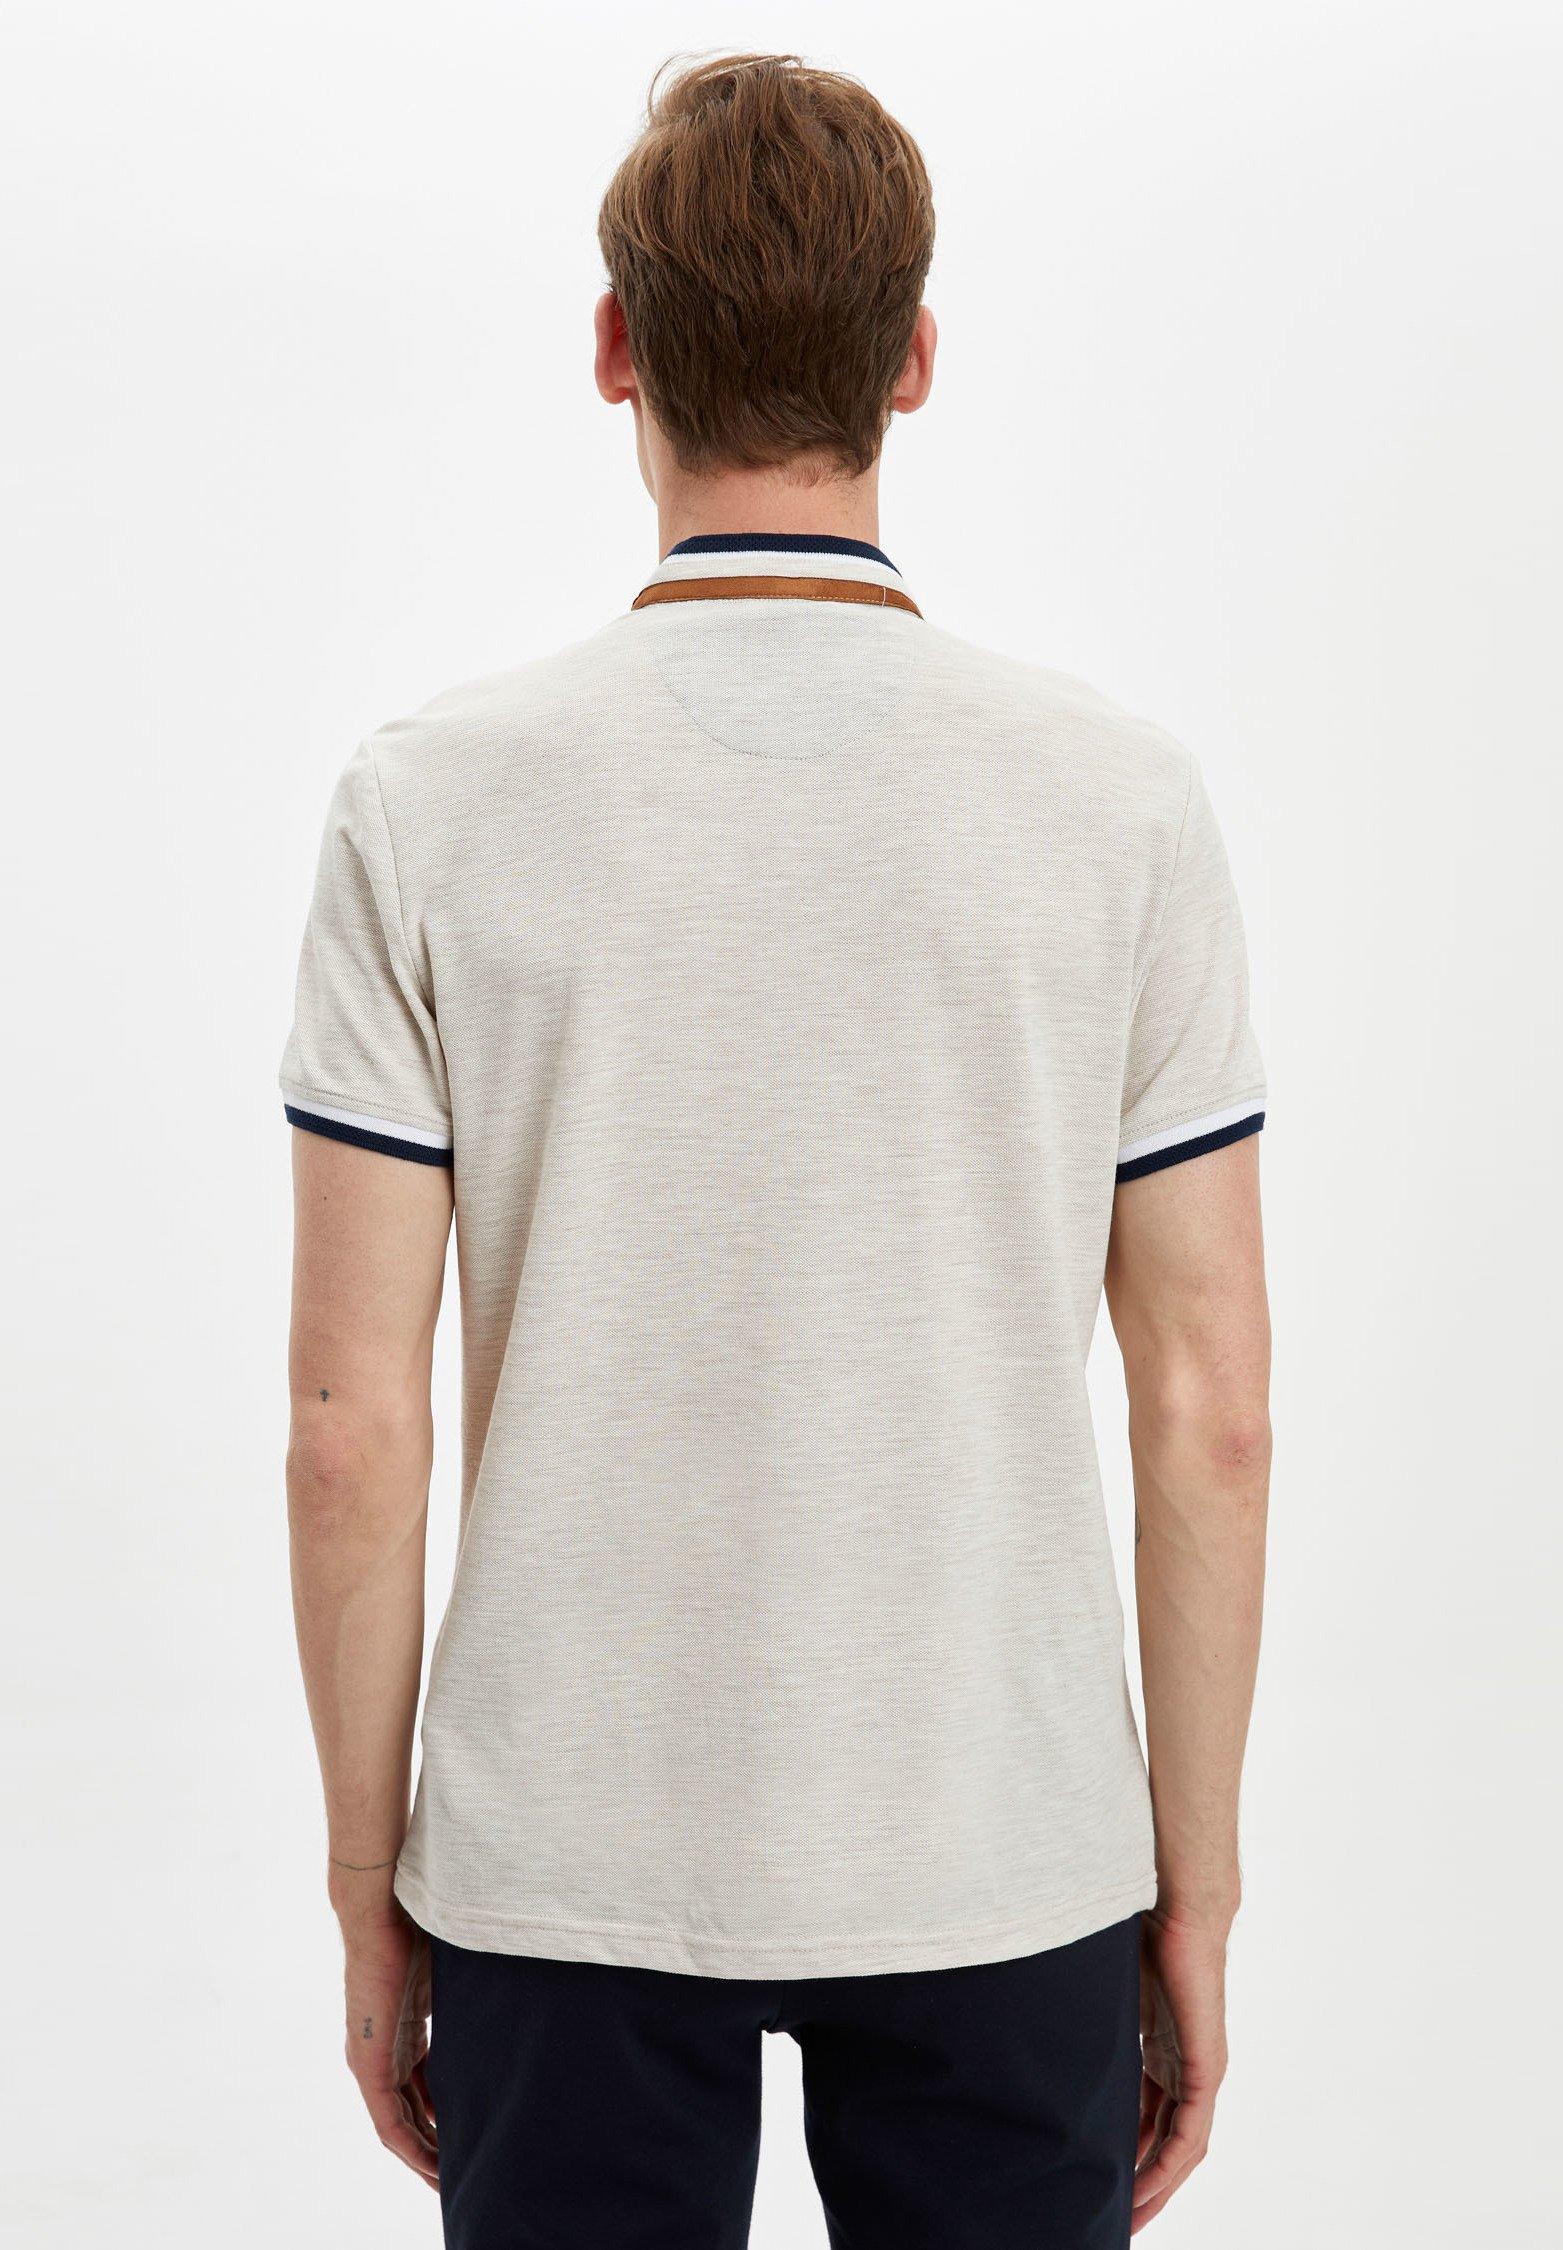 DeFacto Polo shirt - beige wE6Ou